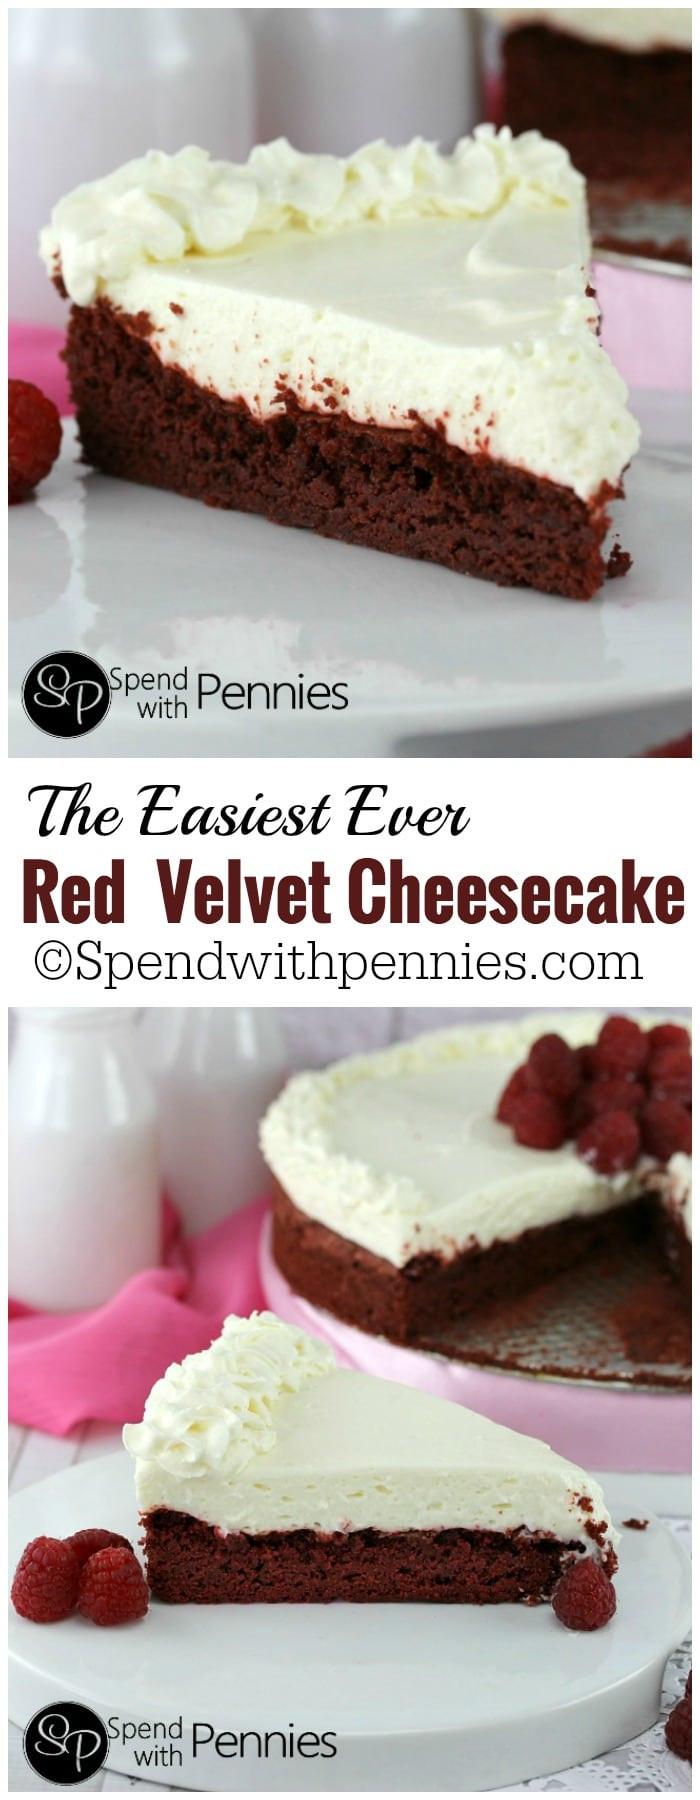 Red Velvet Cheesecake Recipe  Easy Red Velvet Cheesecake Spend With Pennies